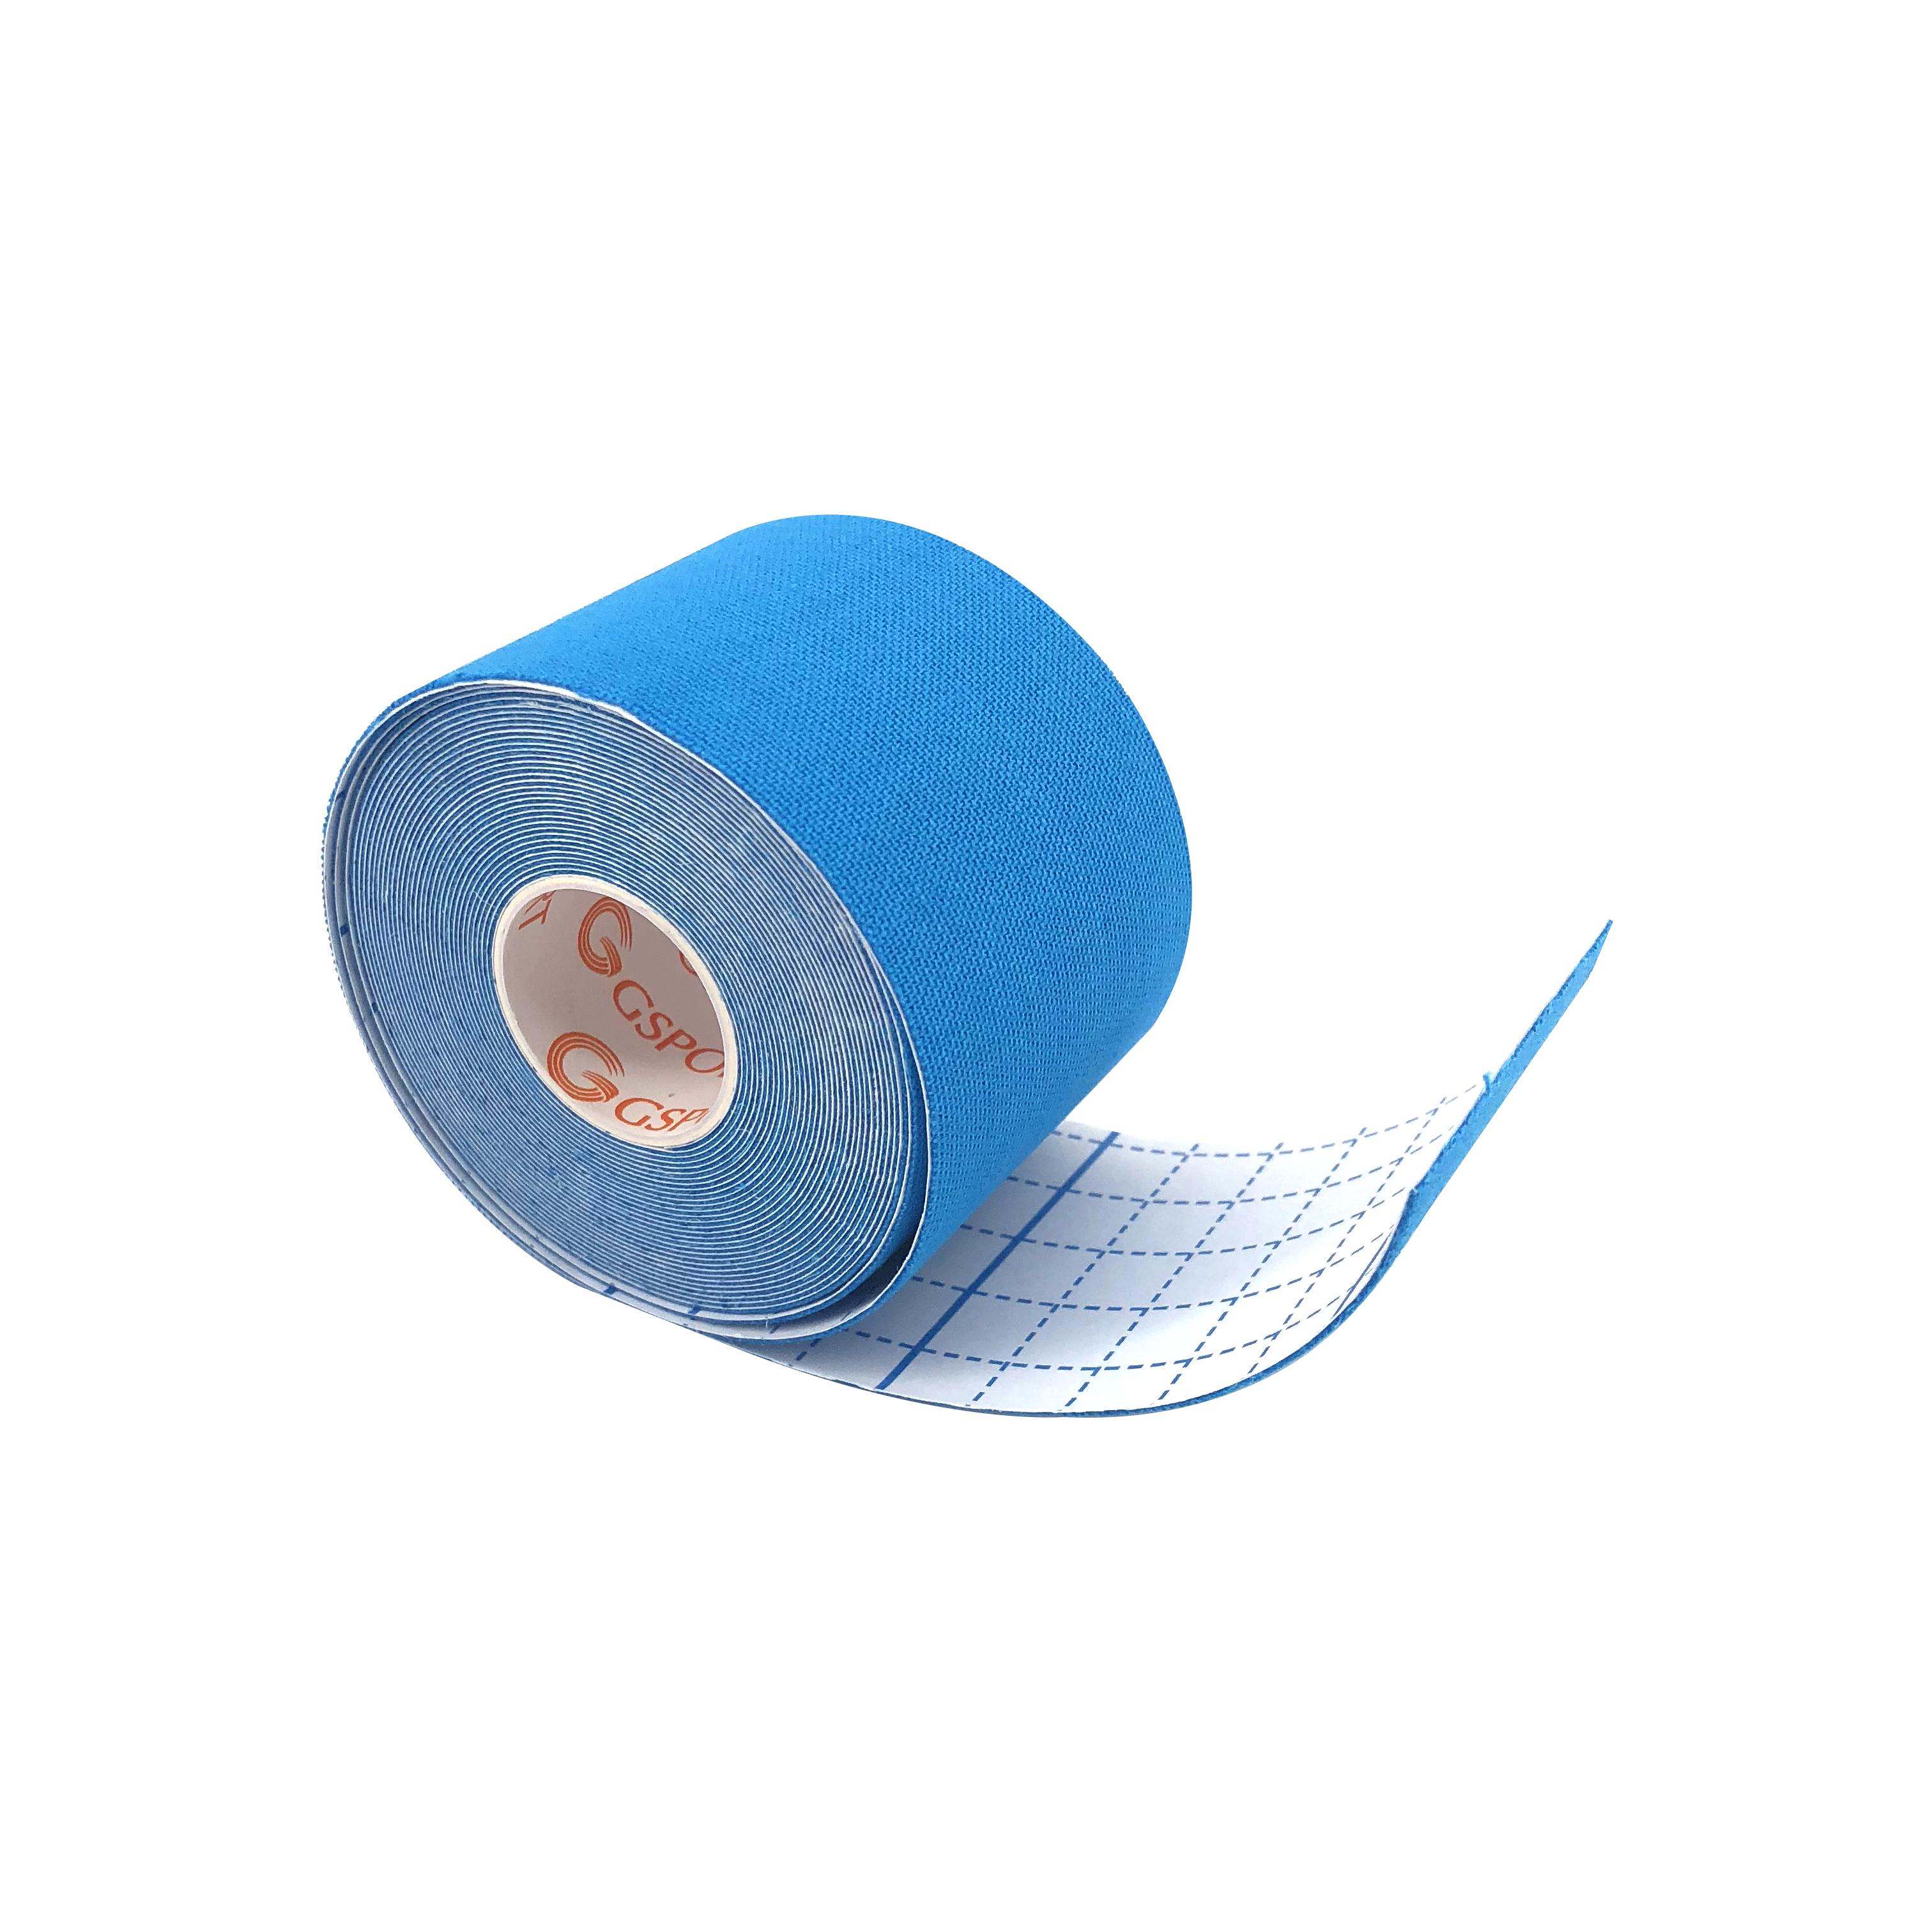 5cm*5m sports tape rock tape self- cut kinesiology tape